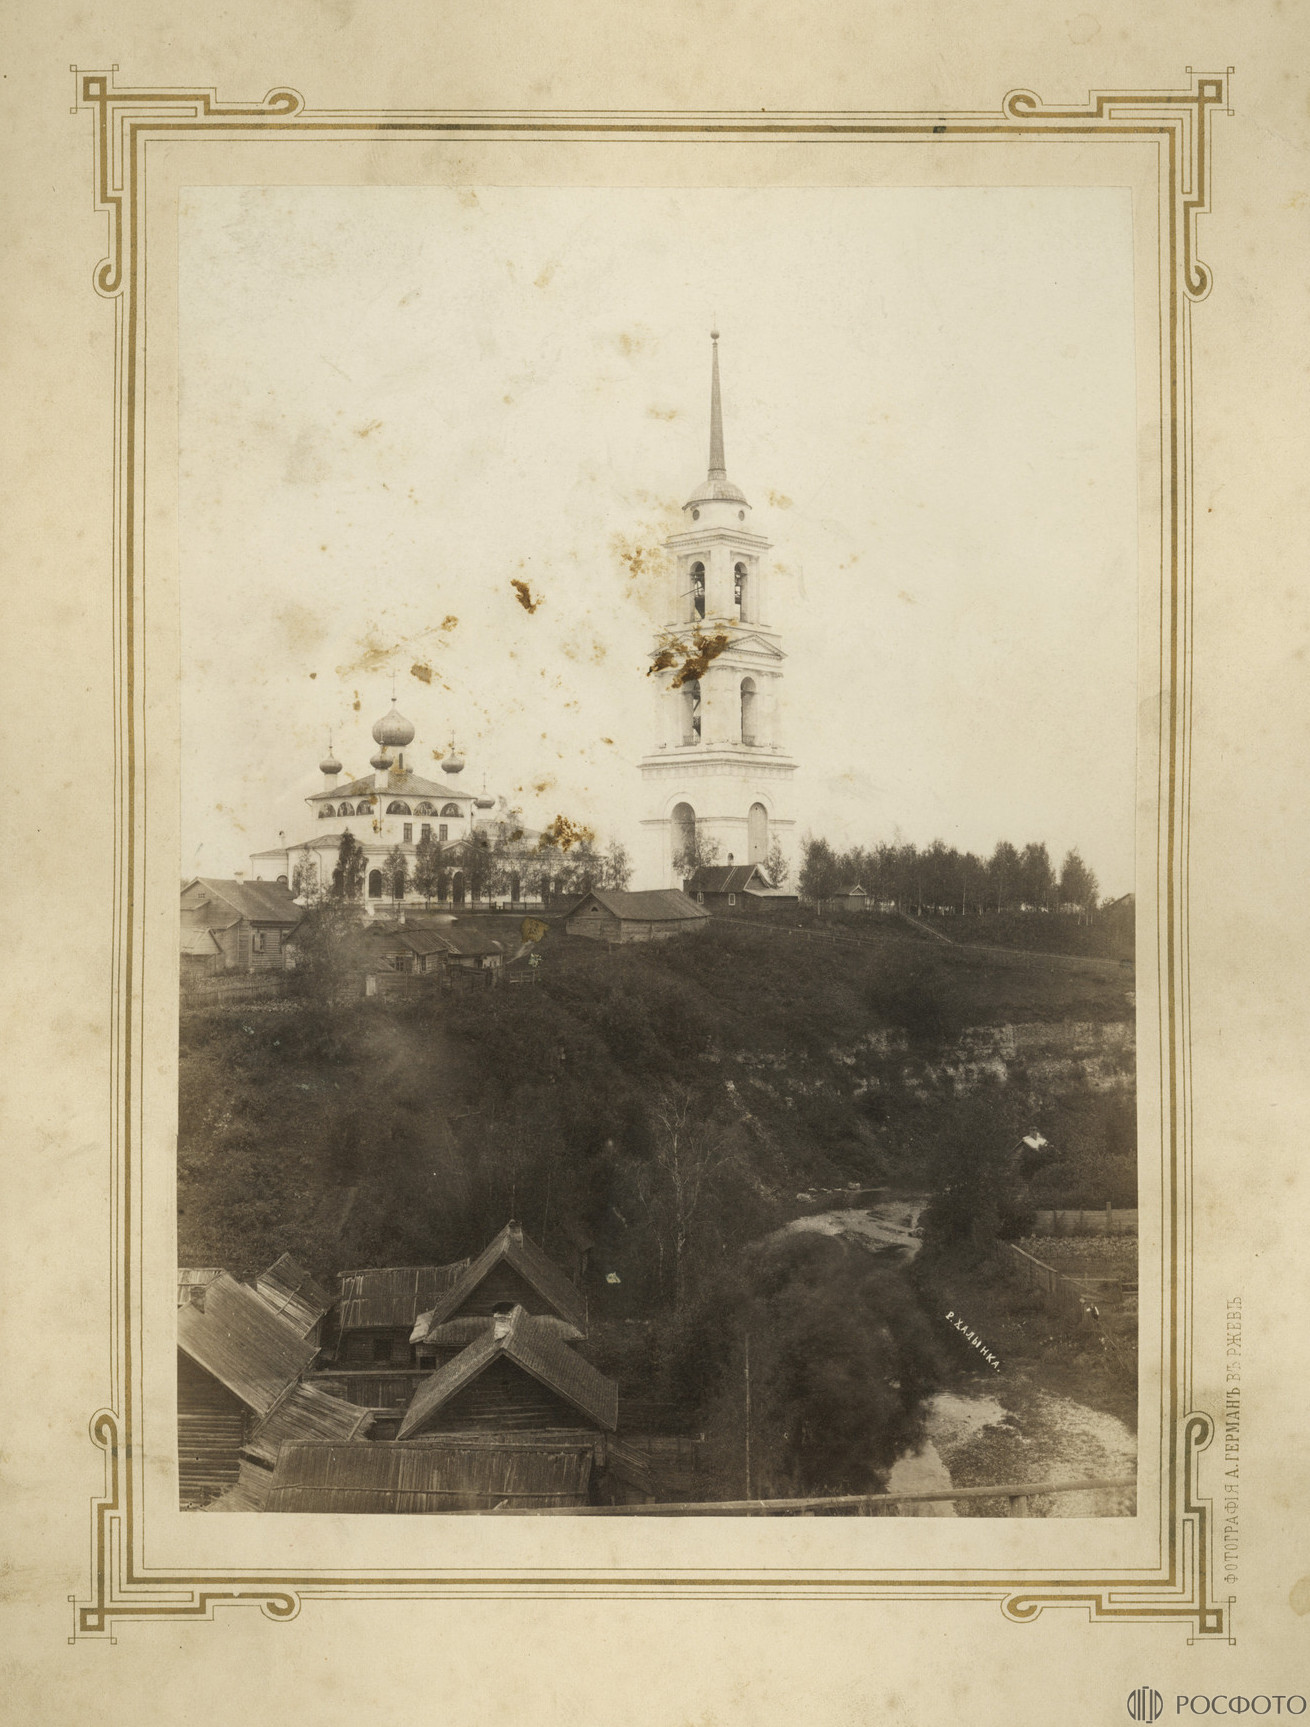 Князь-Федоровская сторона. Панорама реки Халынки и церкви Николая Чудотворца.jpg